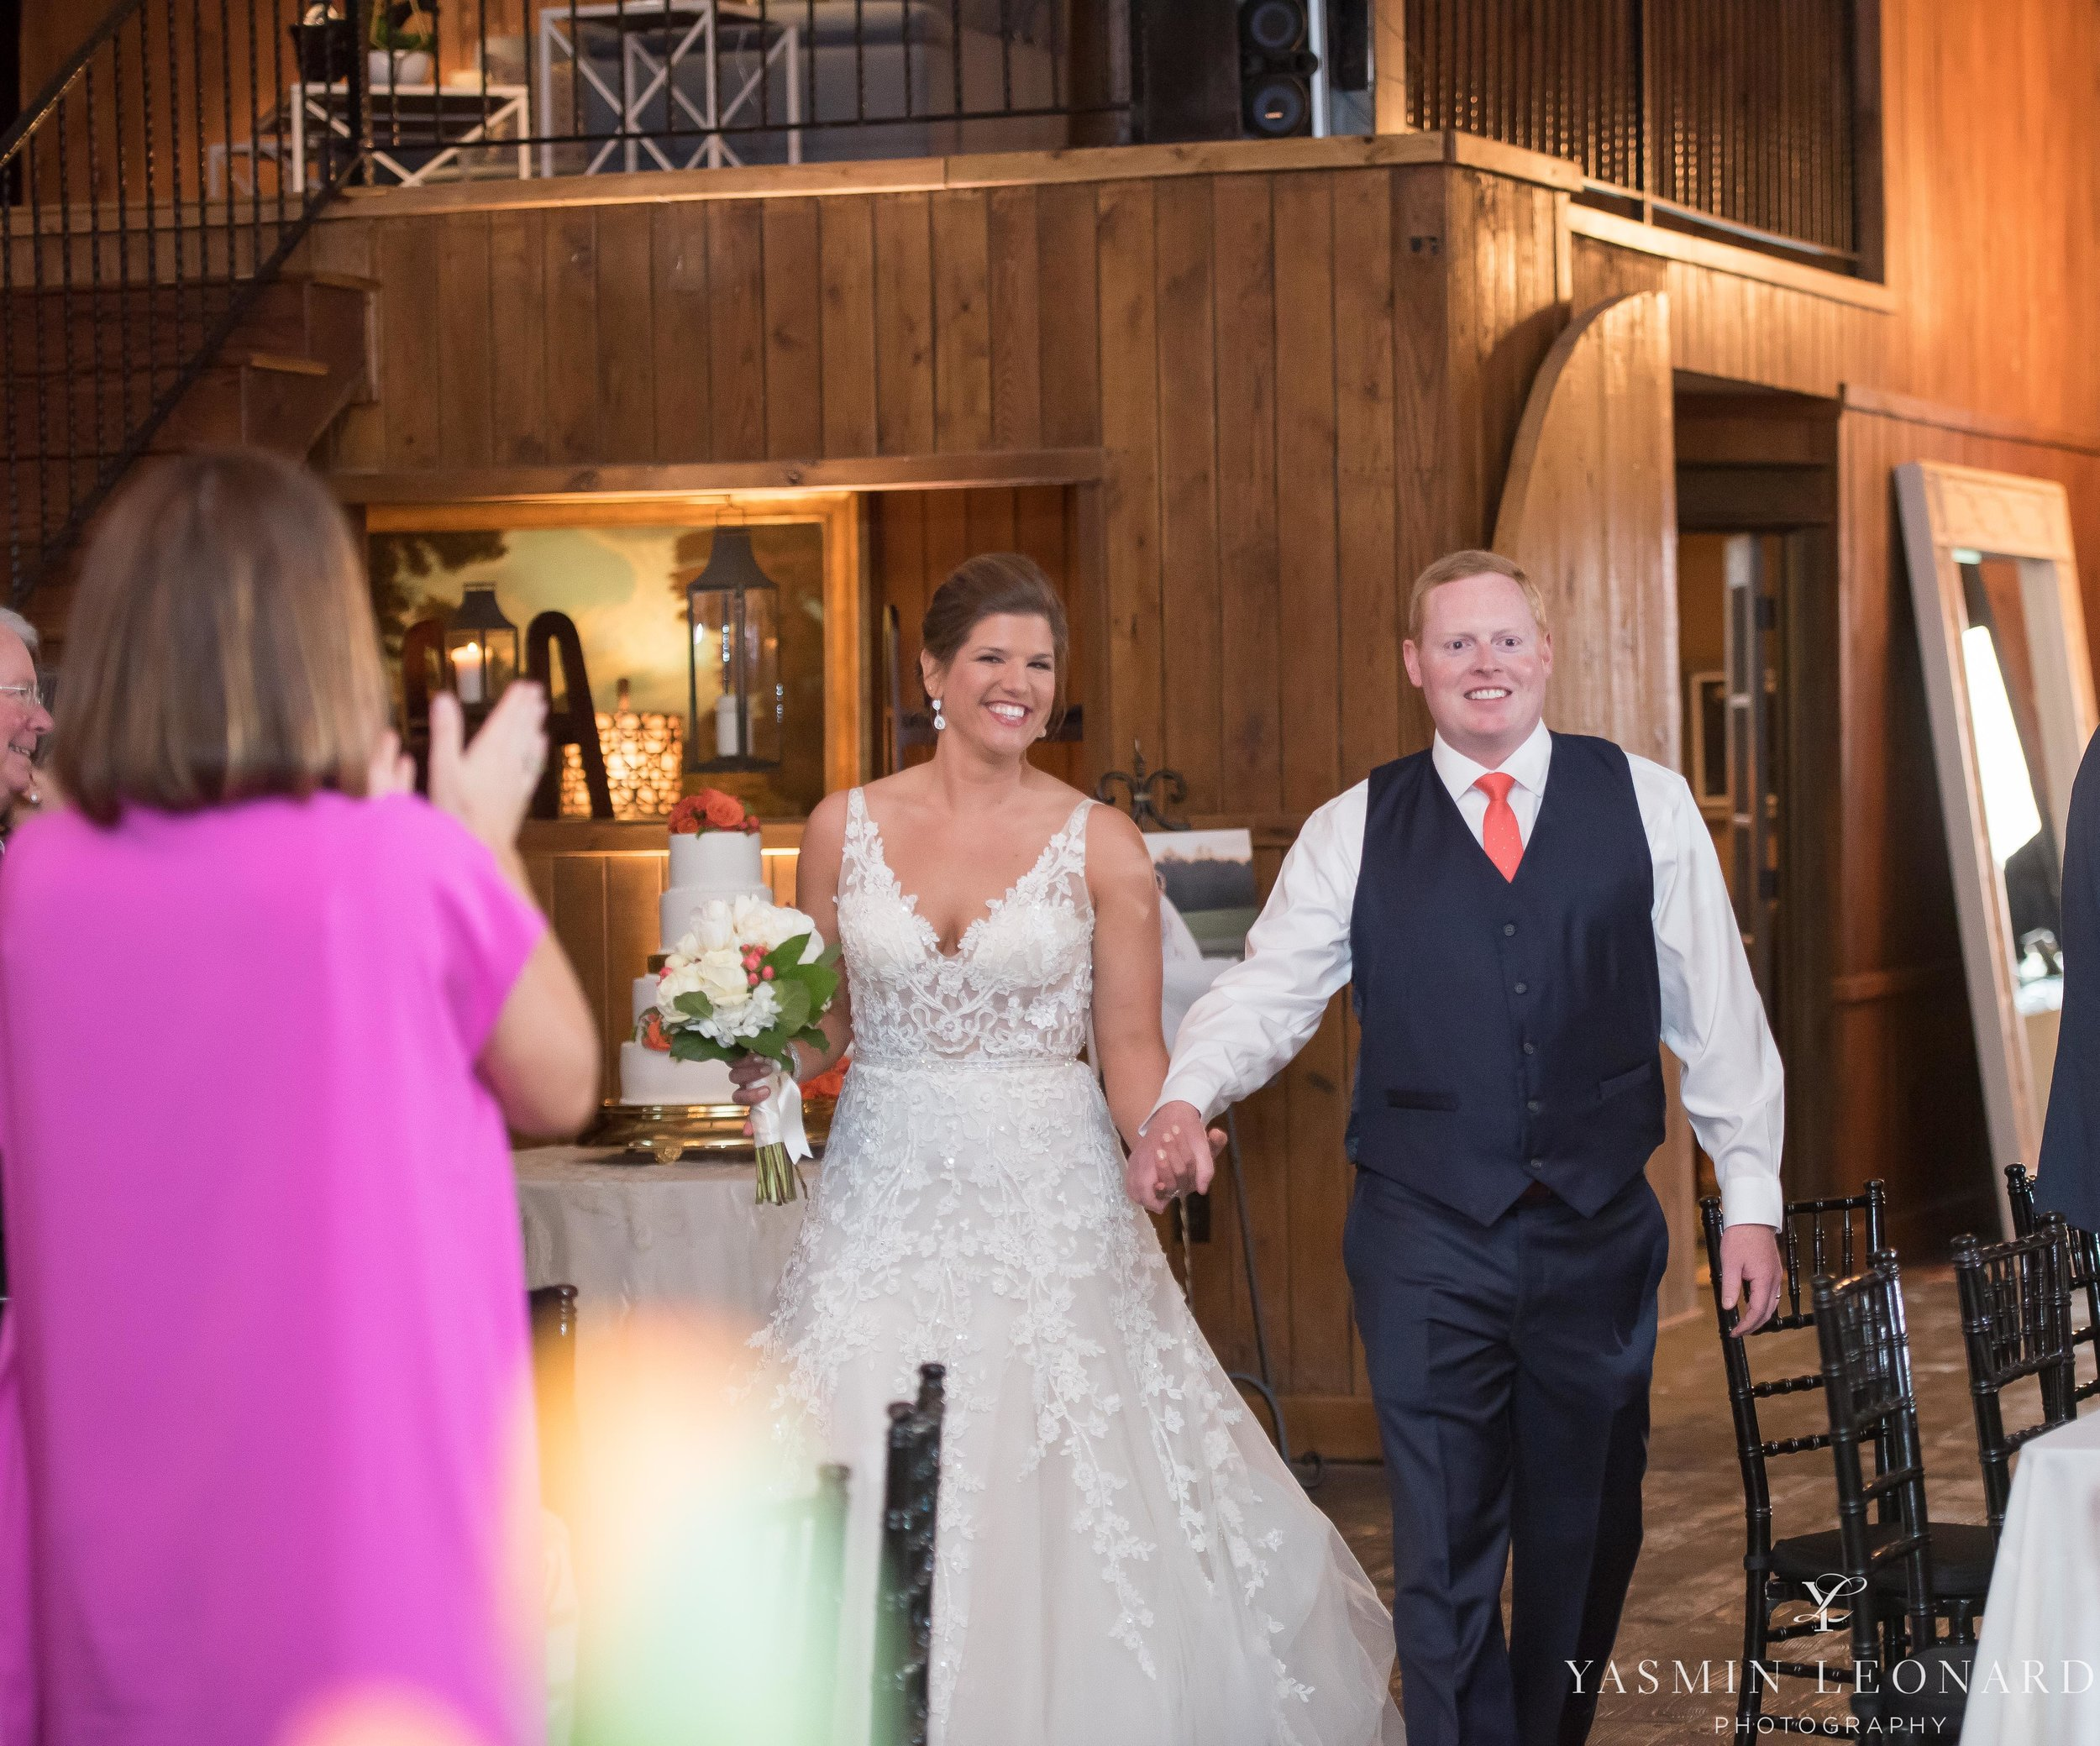 Adaumont Farm - Adaumont Farm Weddings - Trinity Weddings - NC Weddings - Yasmin Leonard Photography-59.jpg